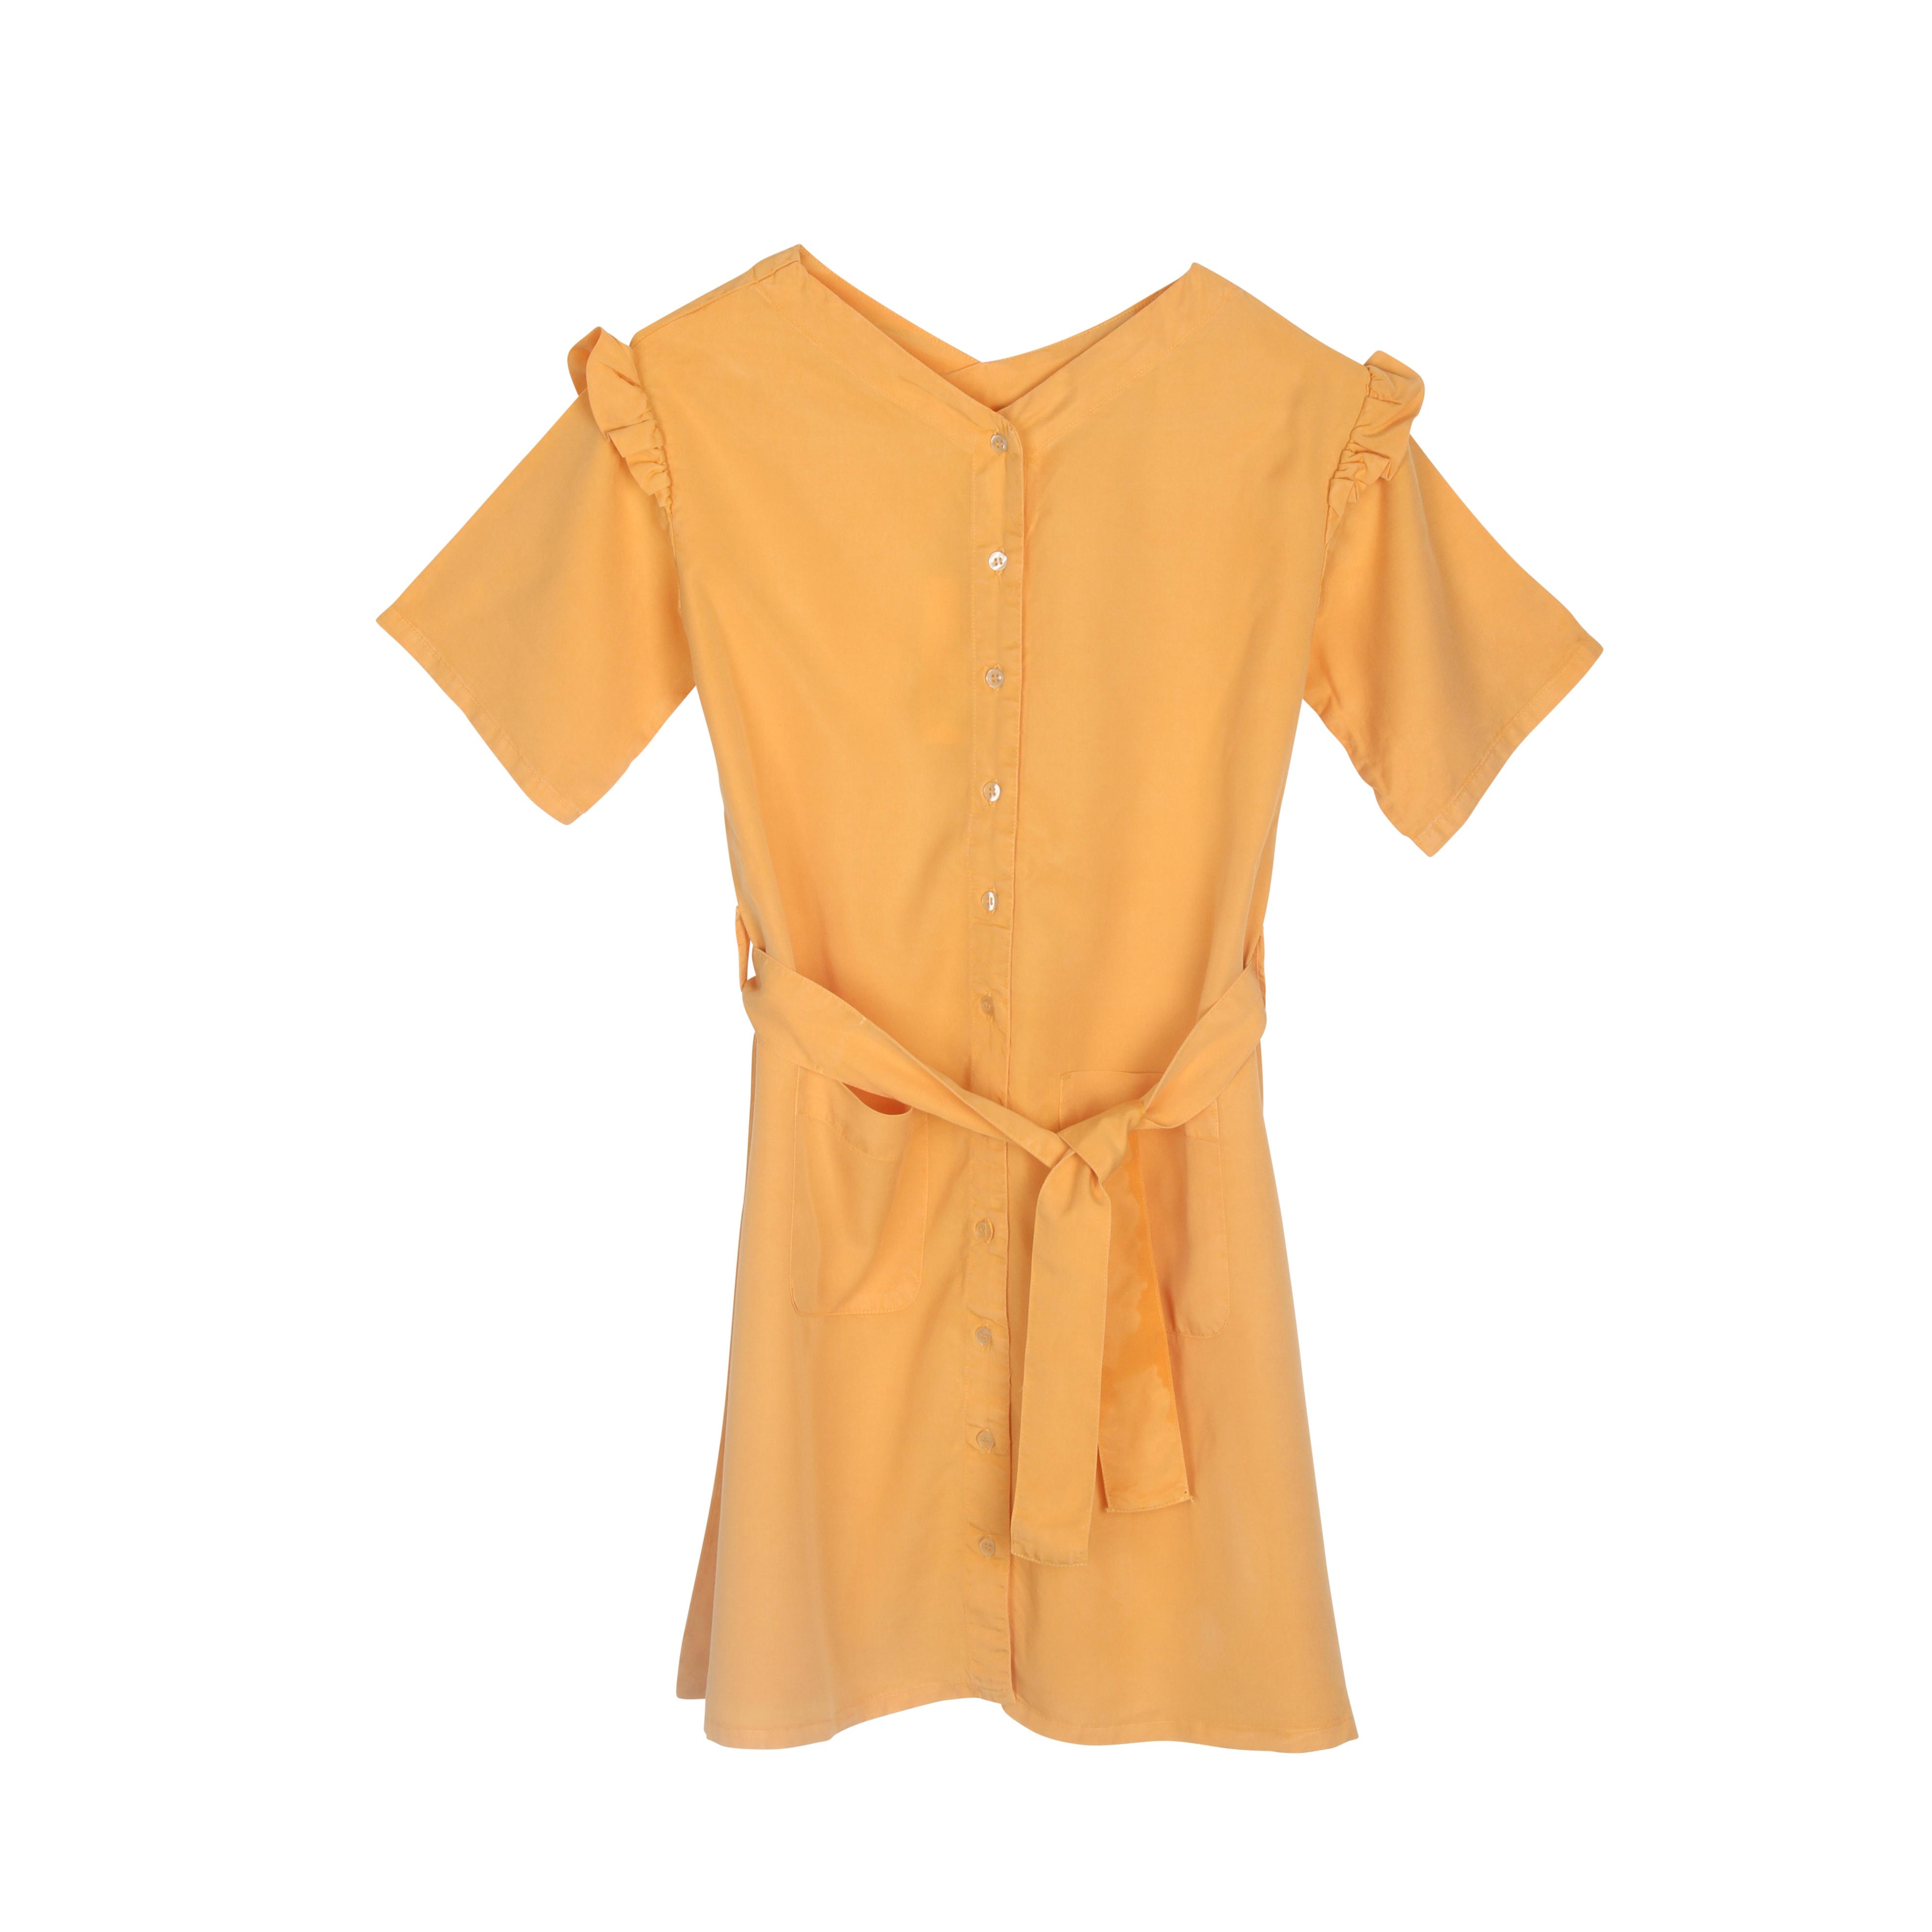 THE BIBIO PROJECT TIE DRESS(BEESWAX)